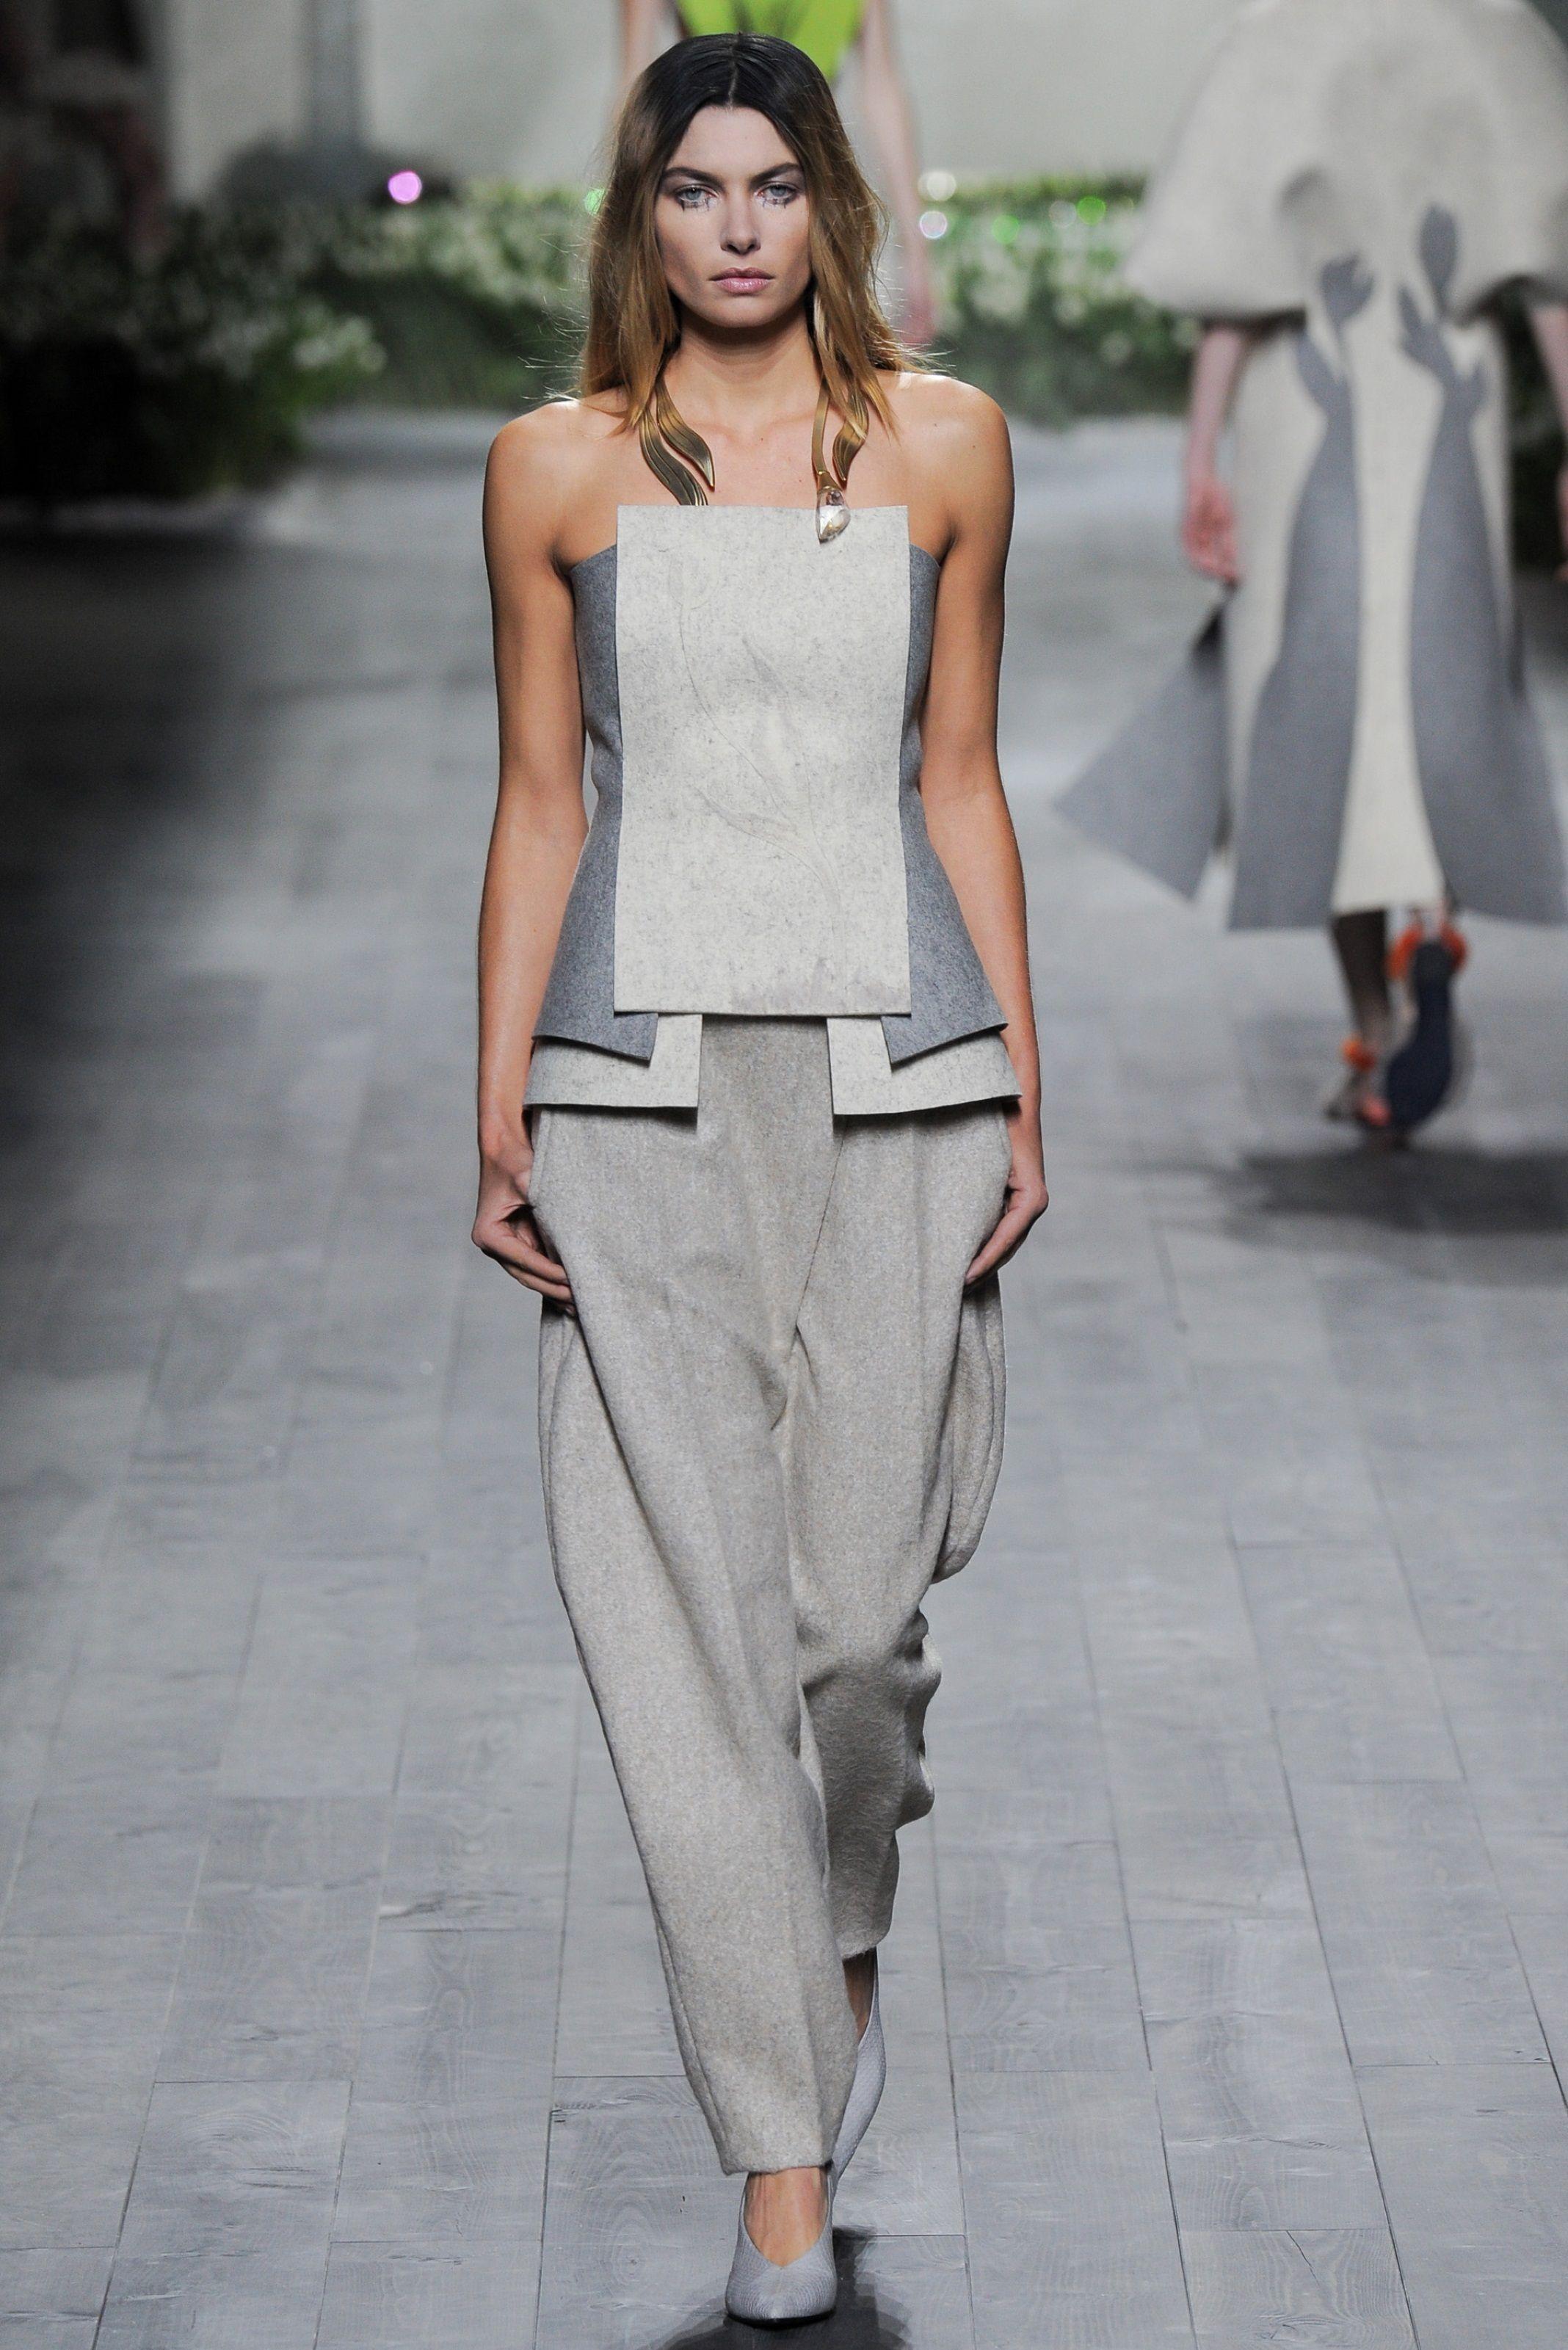 Vionnet Fall - Winter 2014/2015 Paris Fashion Week